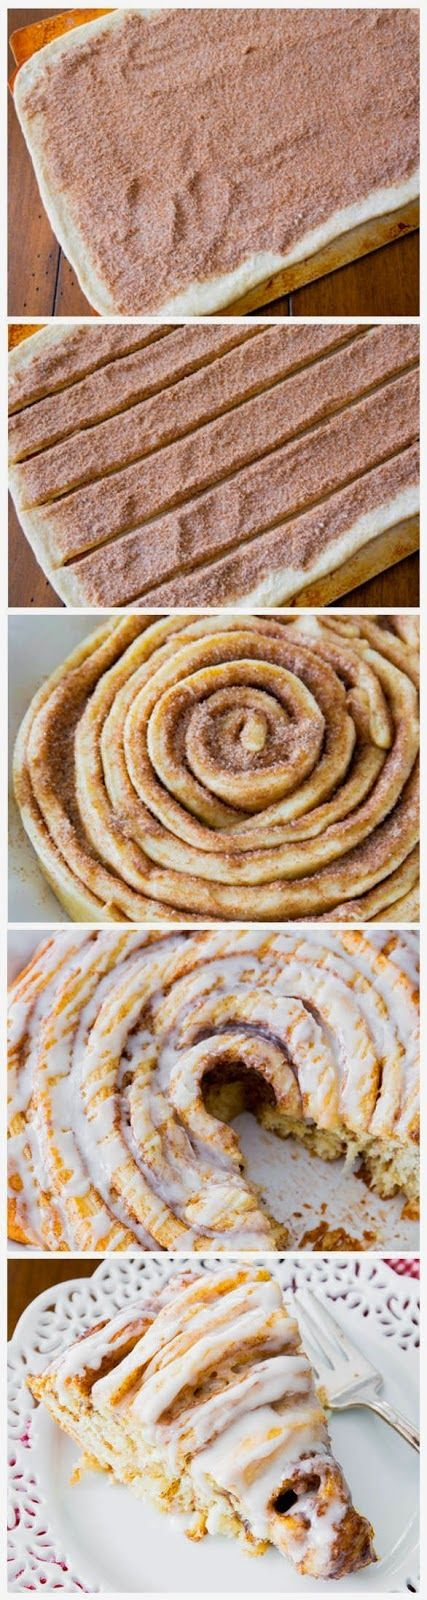 Giant Cinnamon Roll Cake | Food Blog